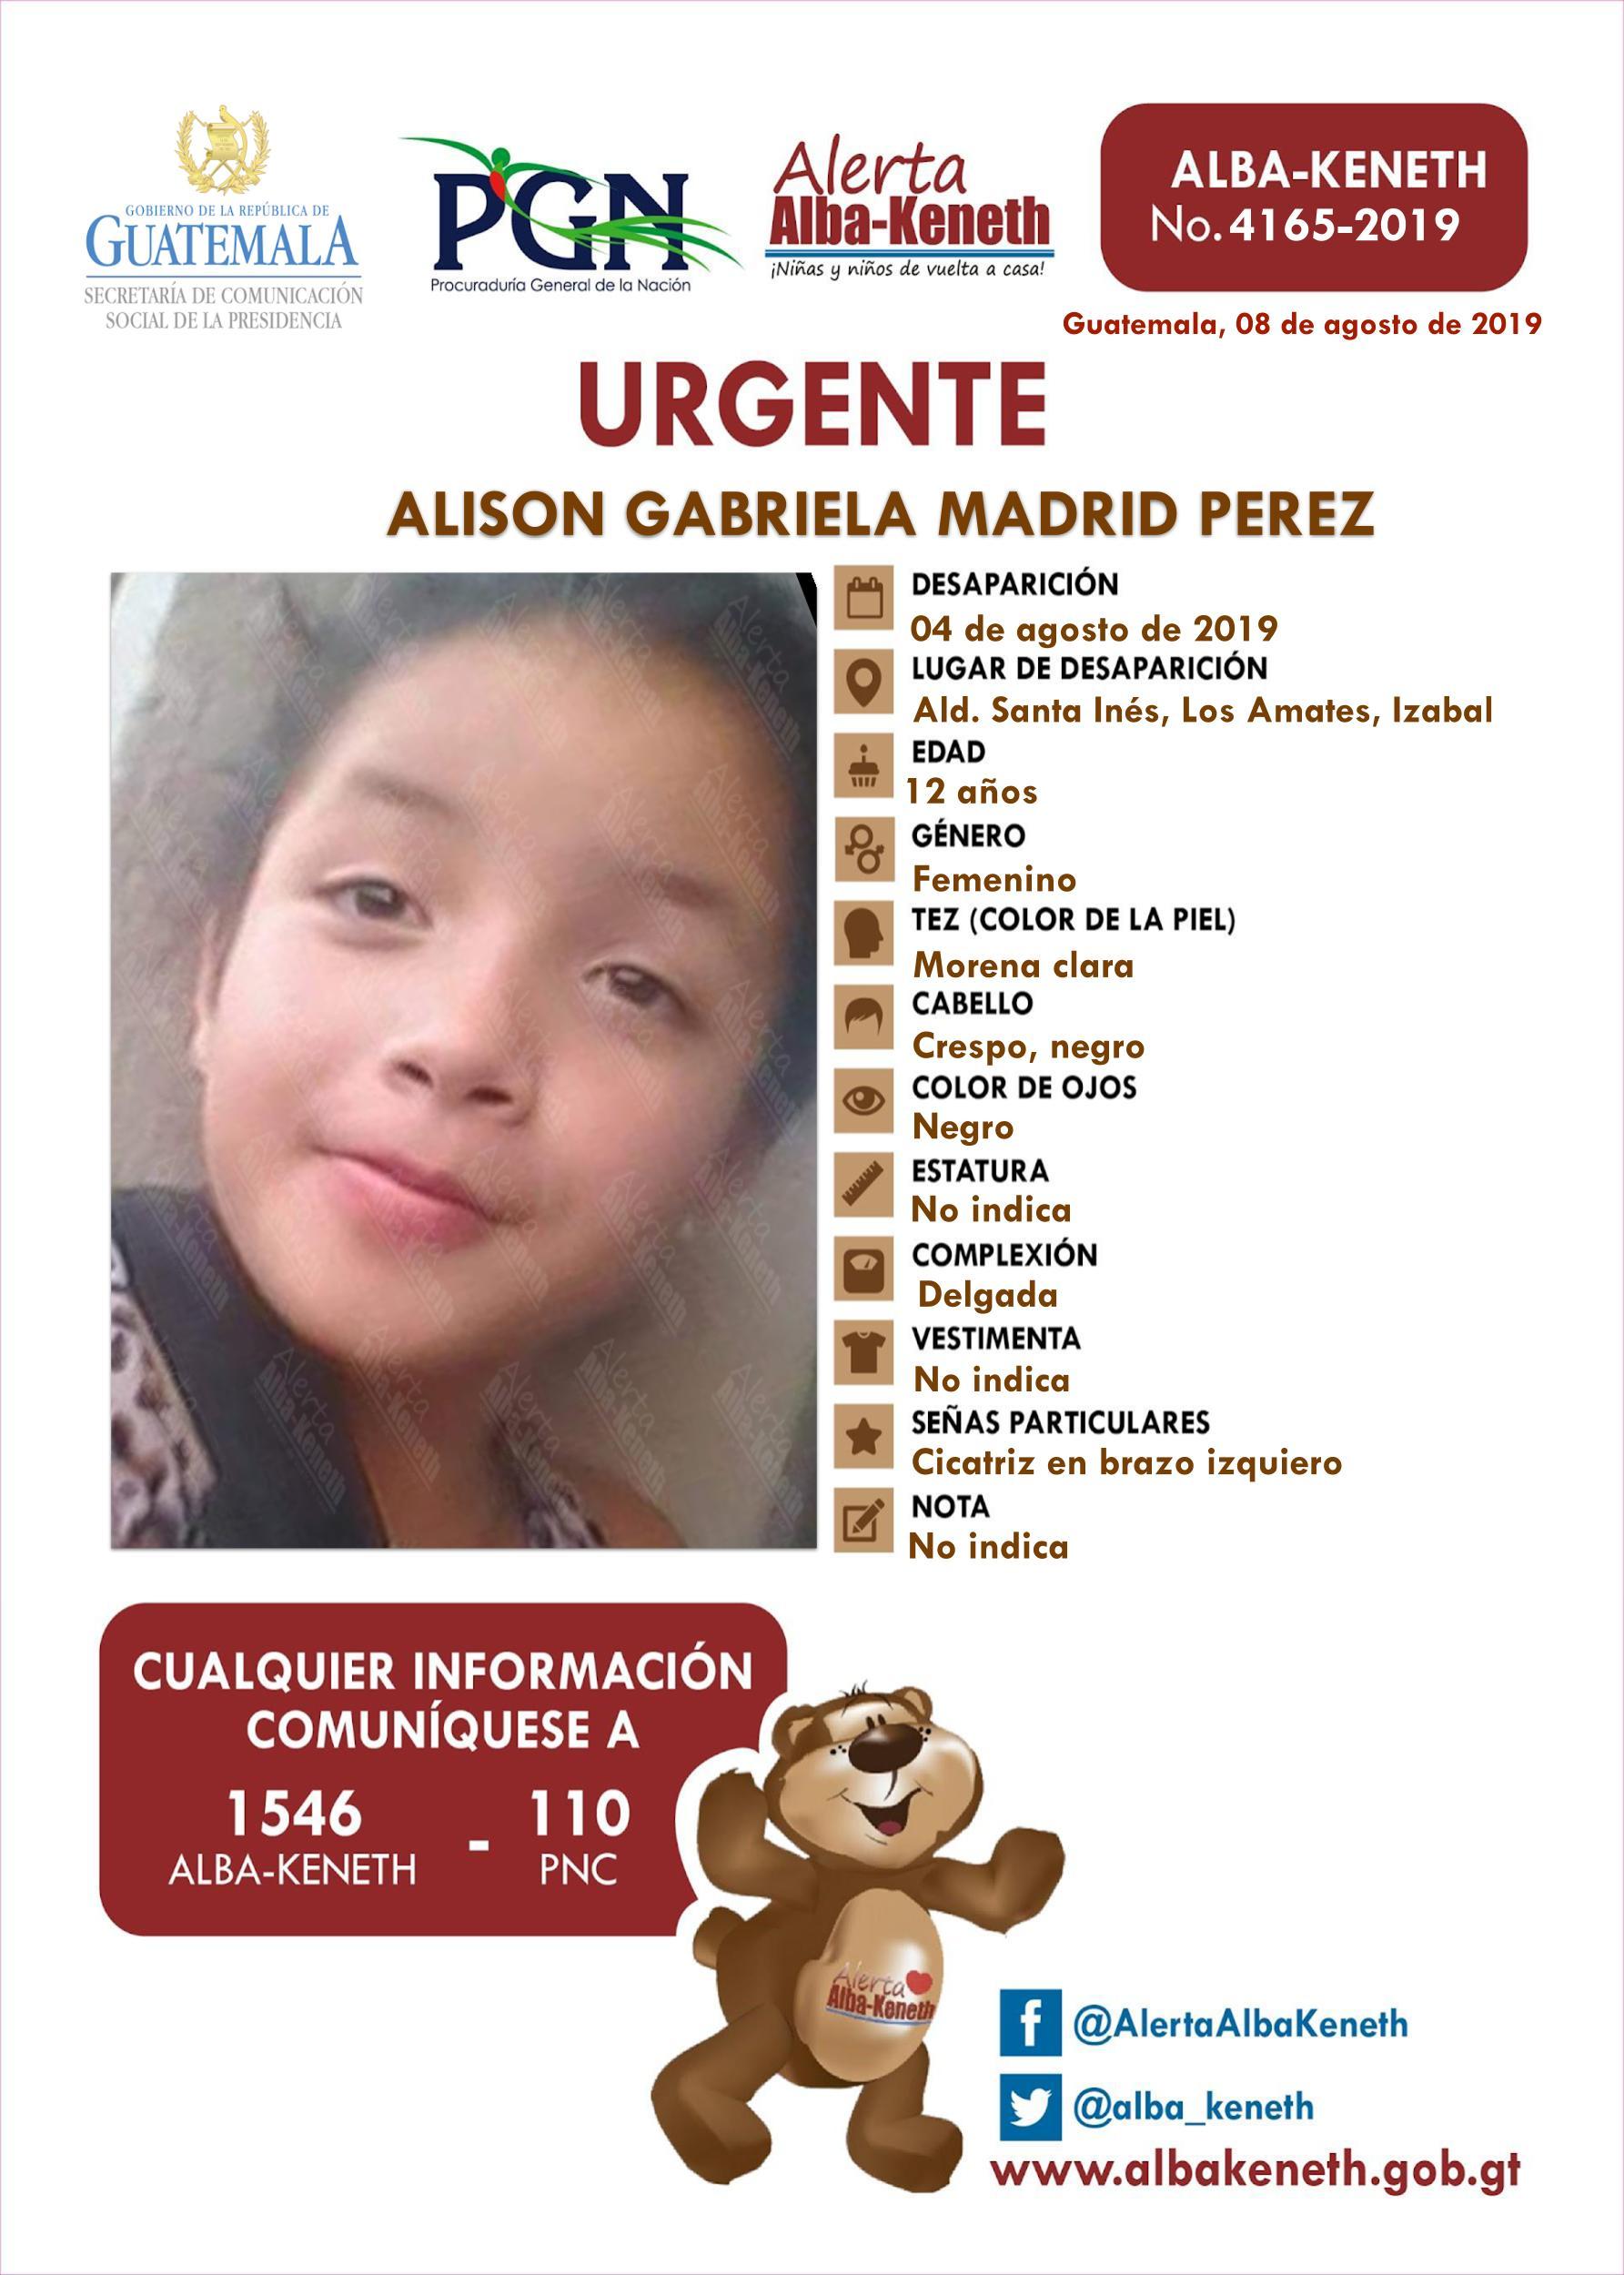 Alison Gabriela Madrid Perez